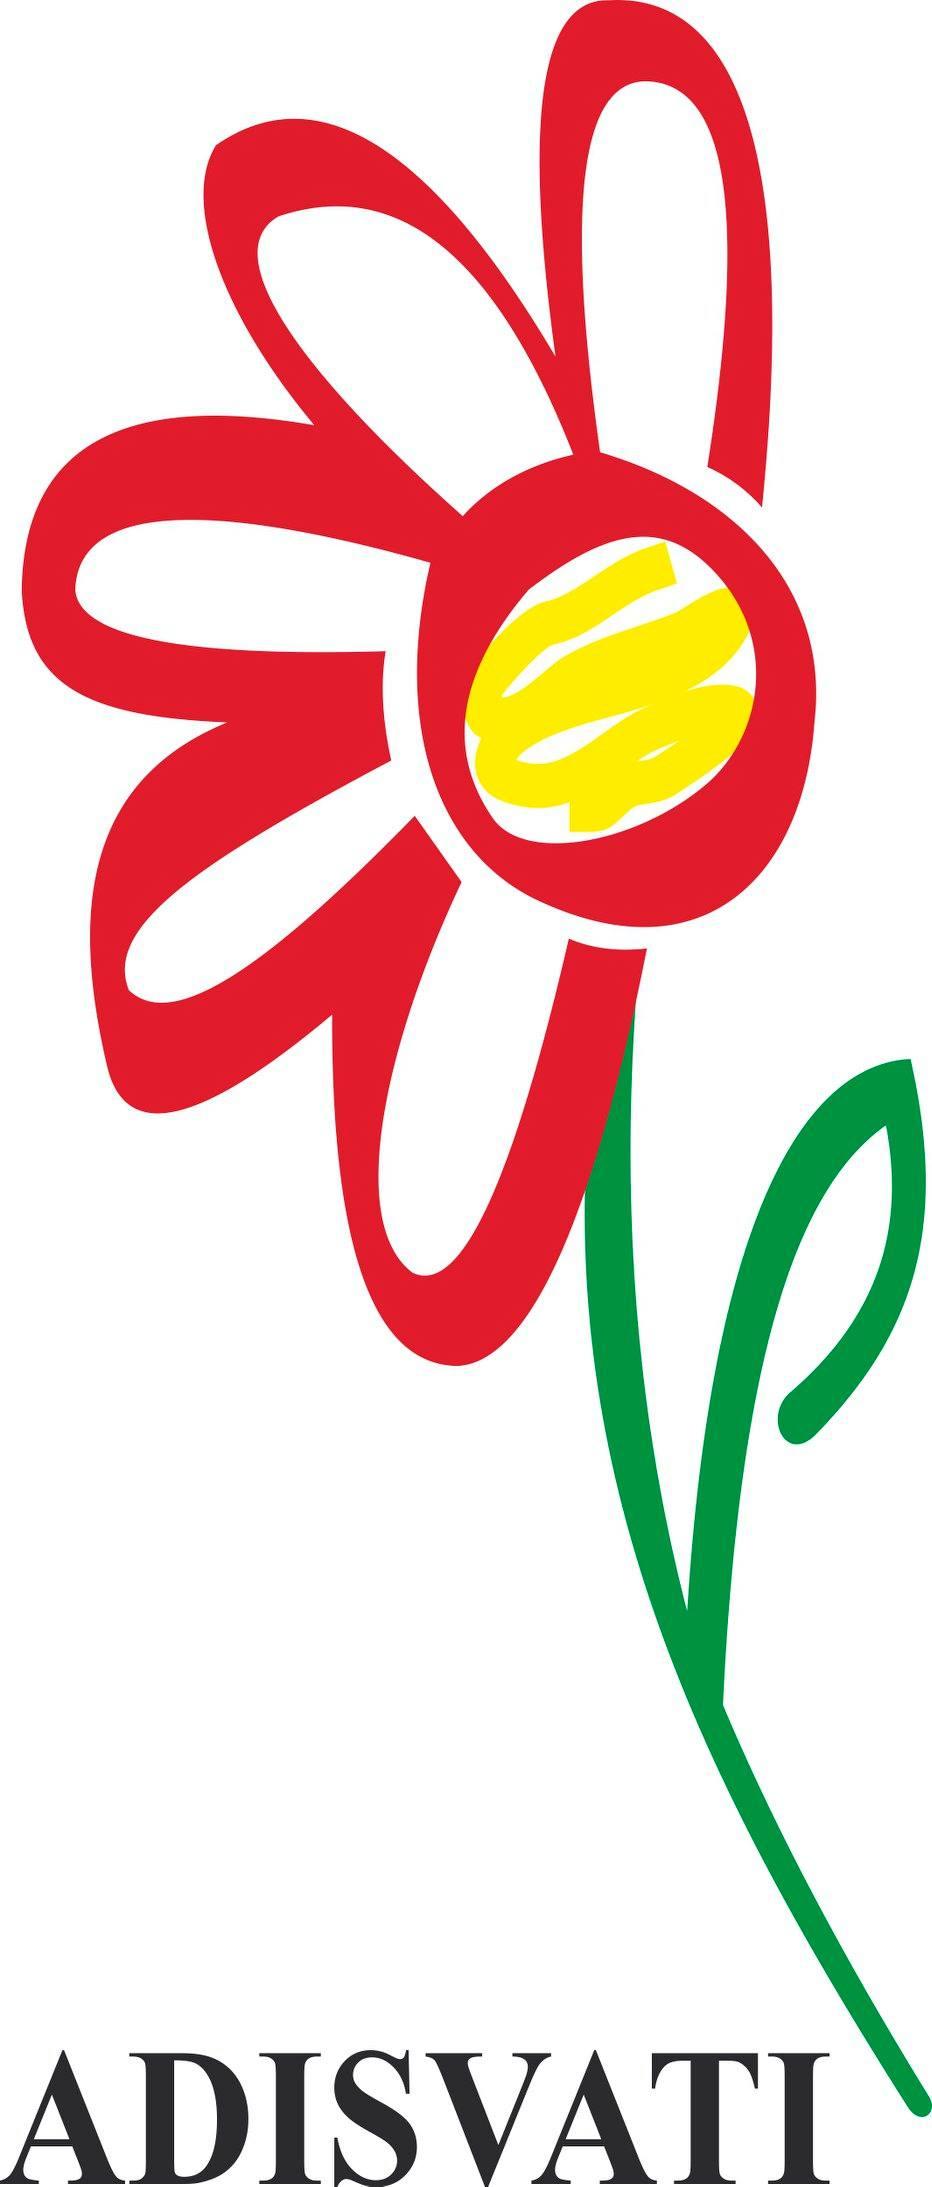 Logotipo Adisvati Candeleda - TiétarTeVe